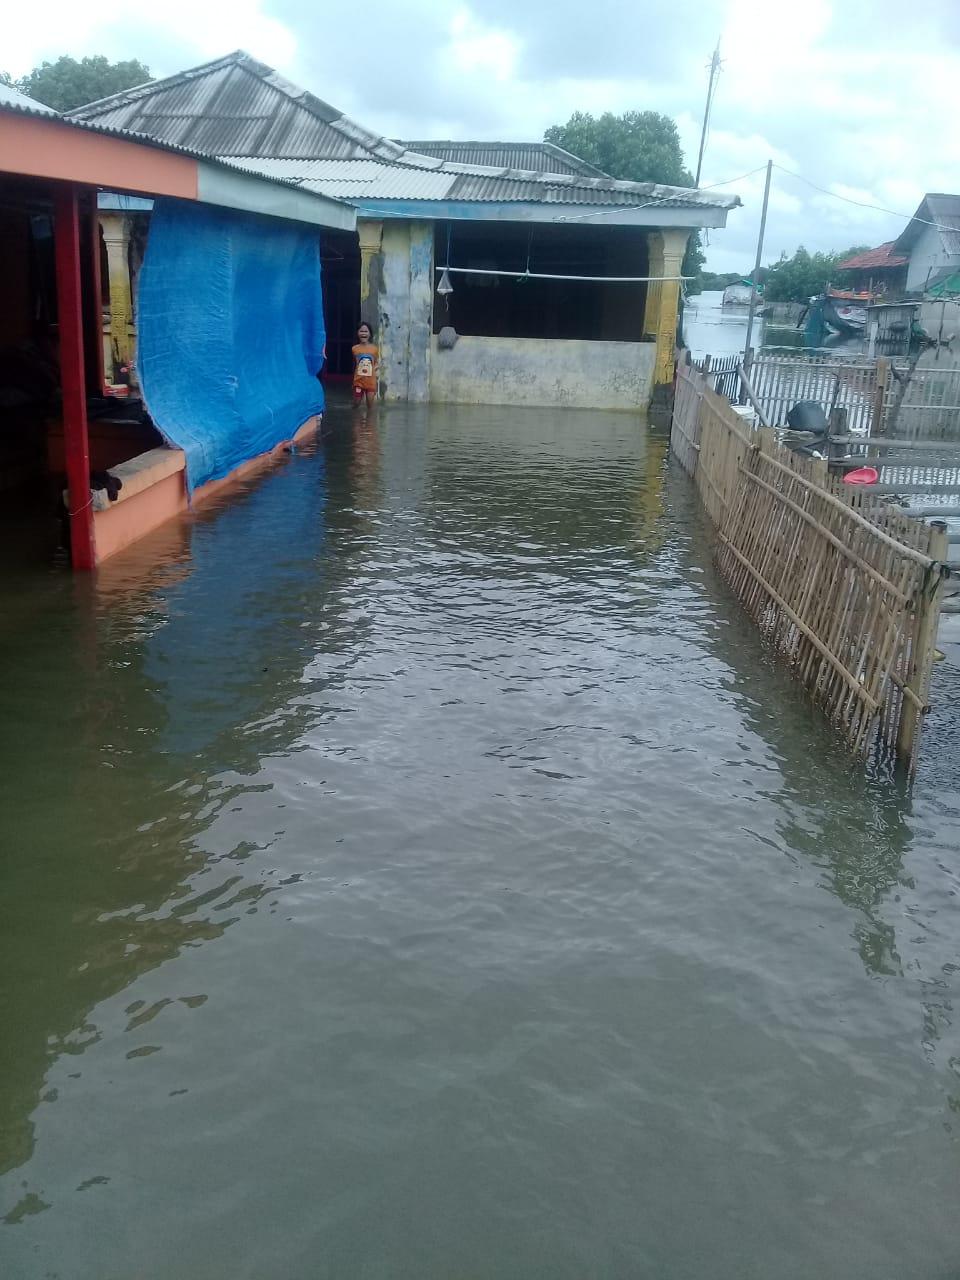 Ratusan Permukiman Warga di Kecamatan Muara Gembong Terendam Air Rob BEKASIMEDIA.COM   MEDIA BEKASI SEJAK 2014